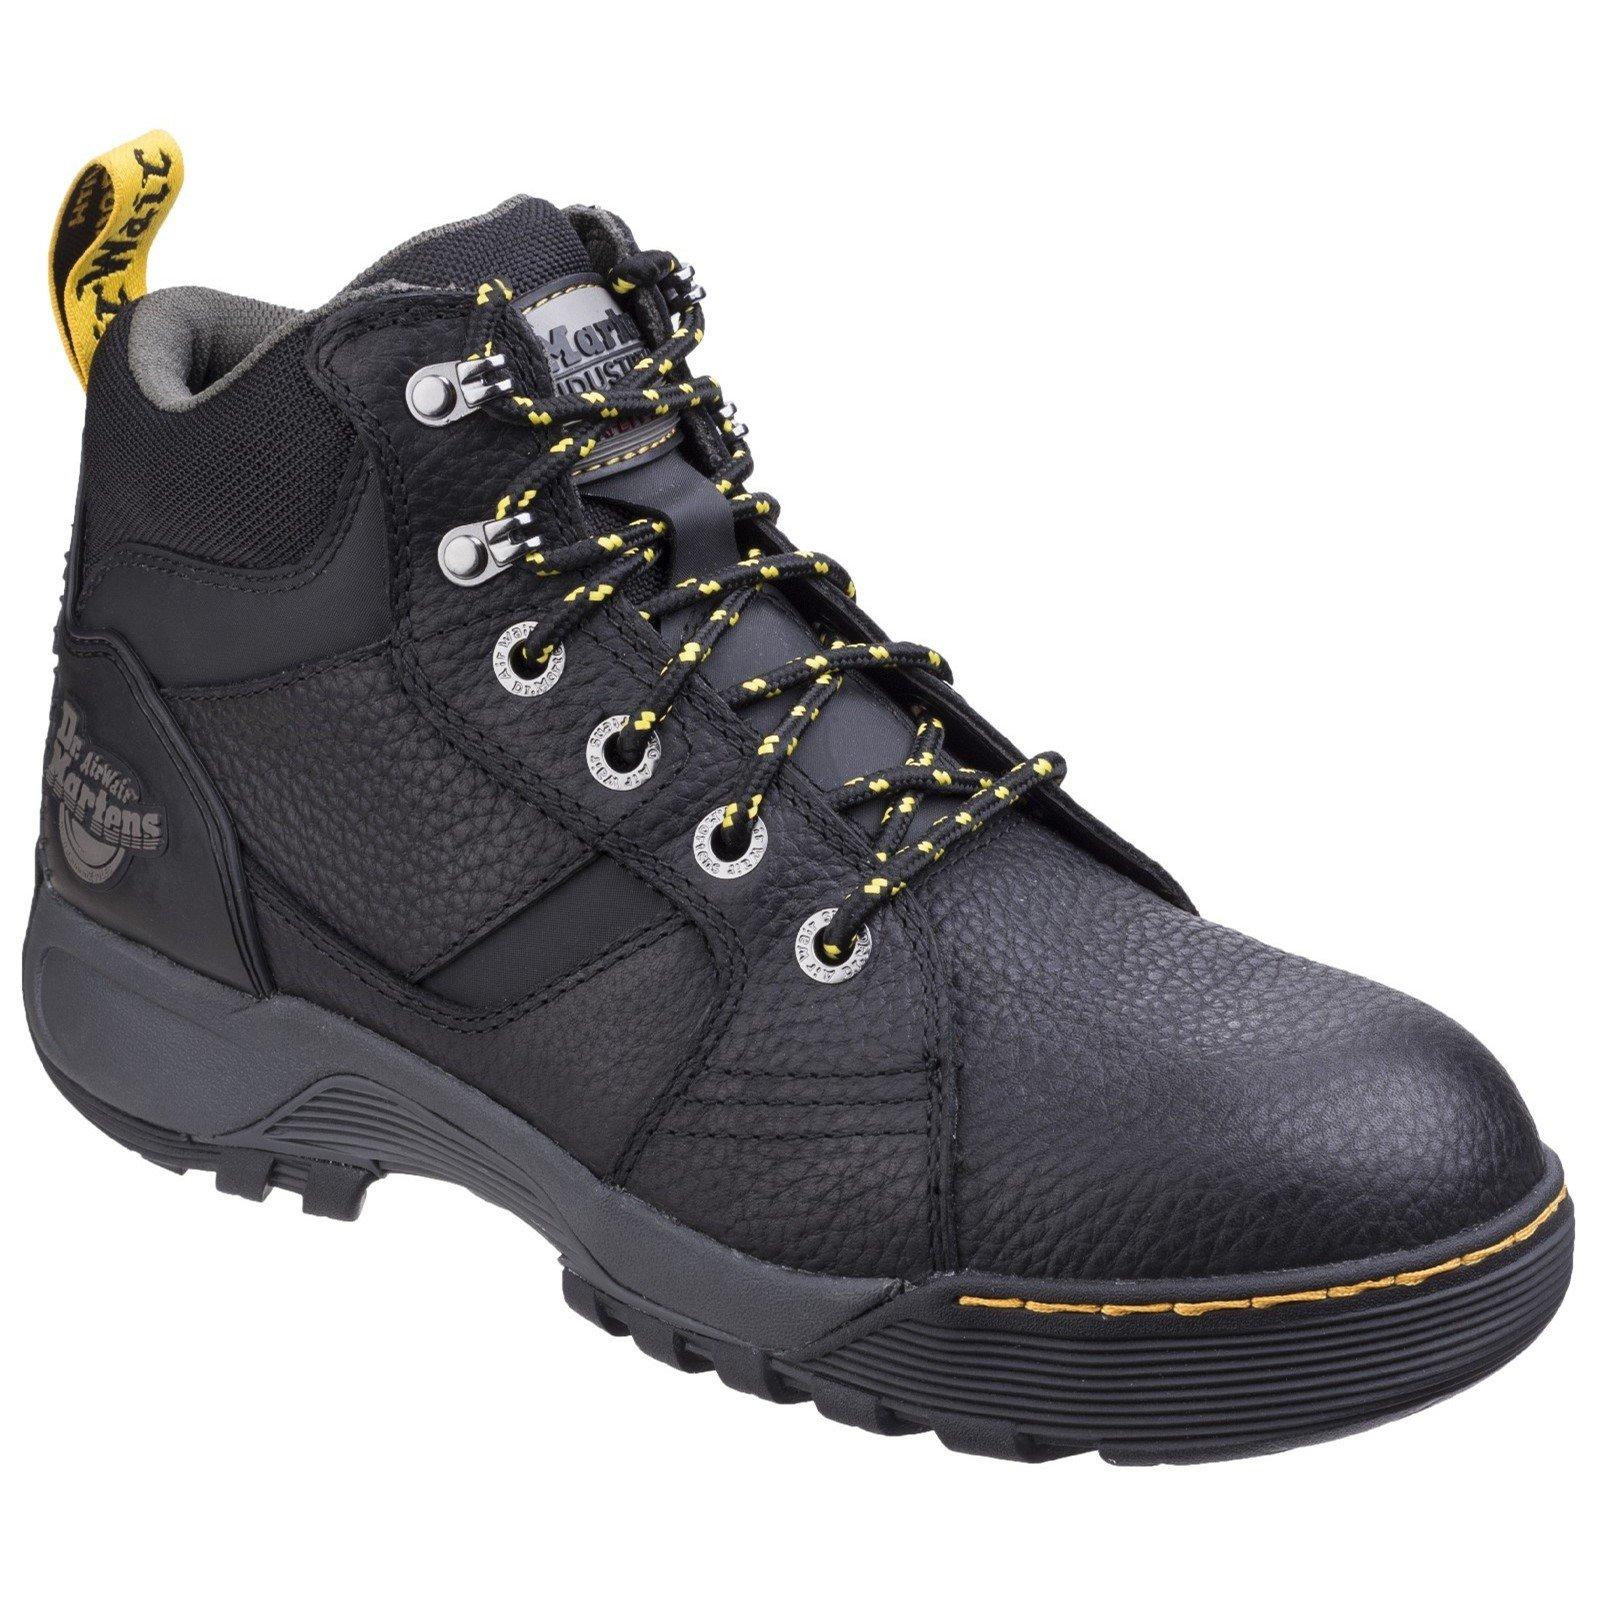 Dr Martens Men's Grapple Safety Boot Various Colours 26023 - Black 10